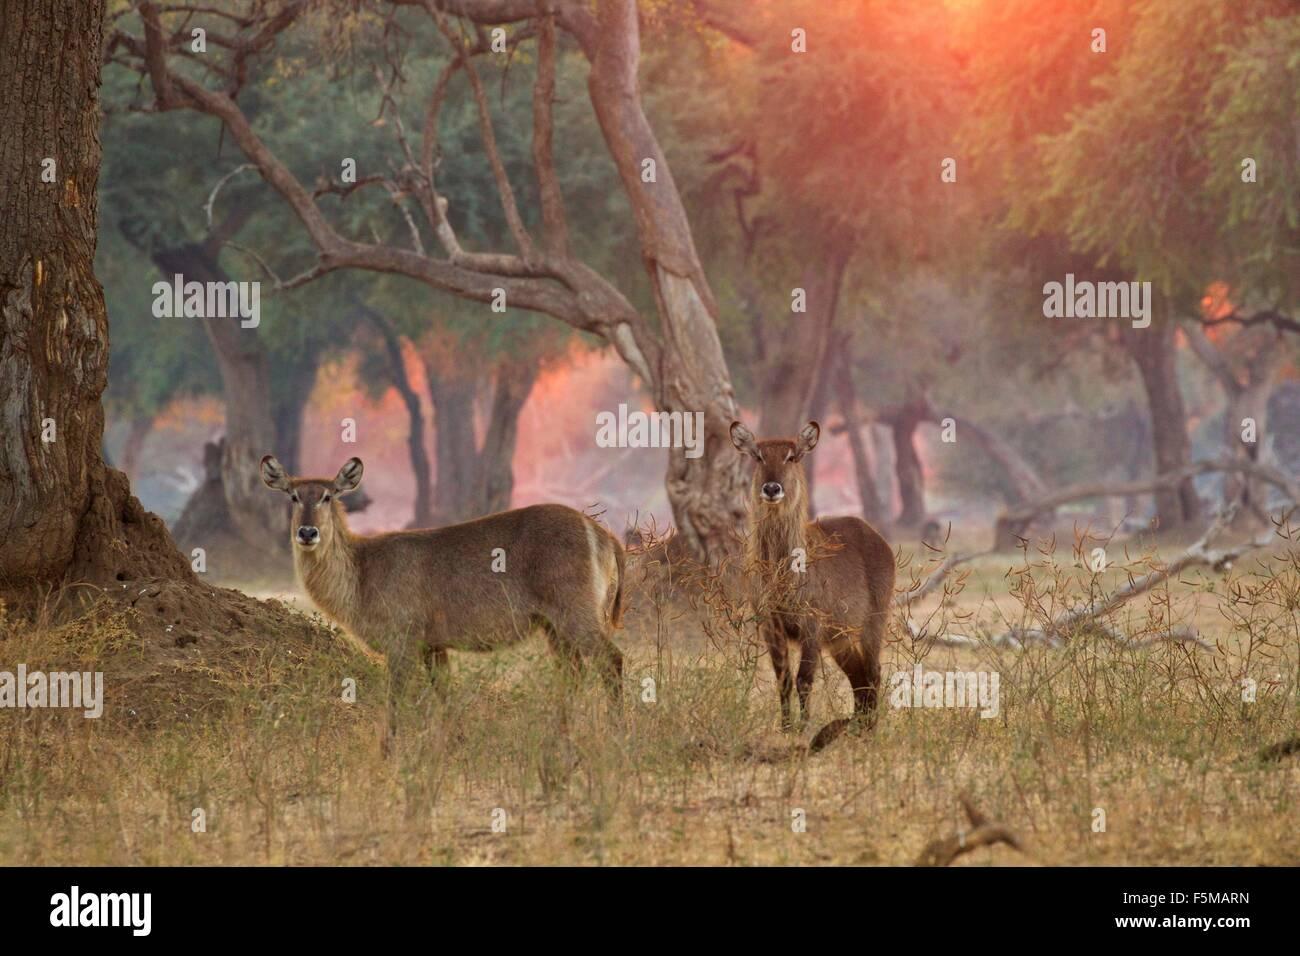 Due femmina waterbucks (Kobus ellipsiprymnus), il Parco Nazionale di Mana Pools, Zimbabwe Immagini Stock